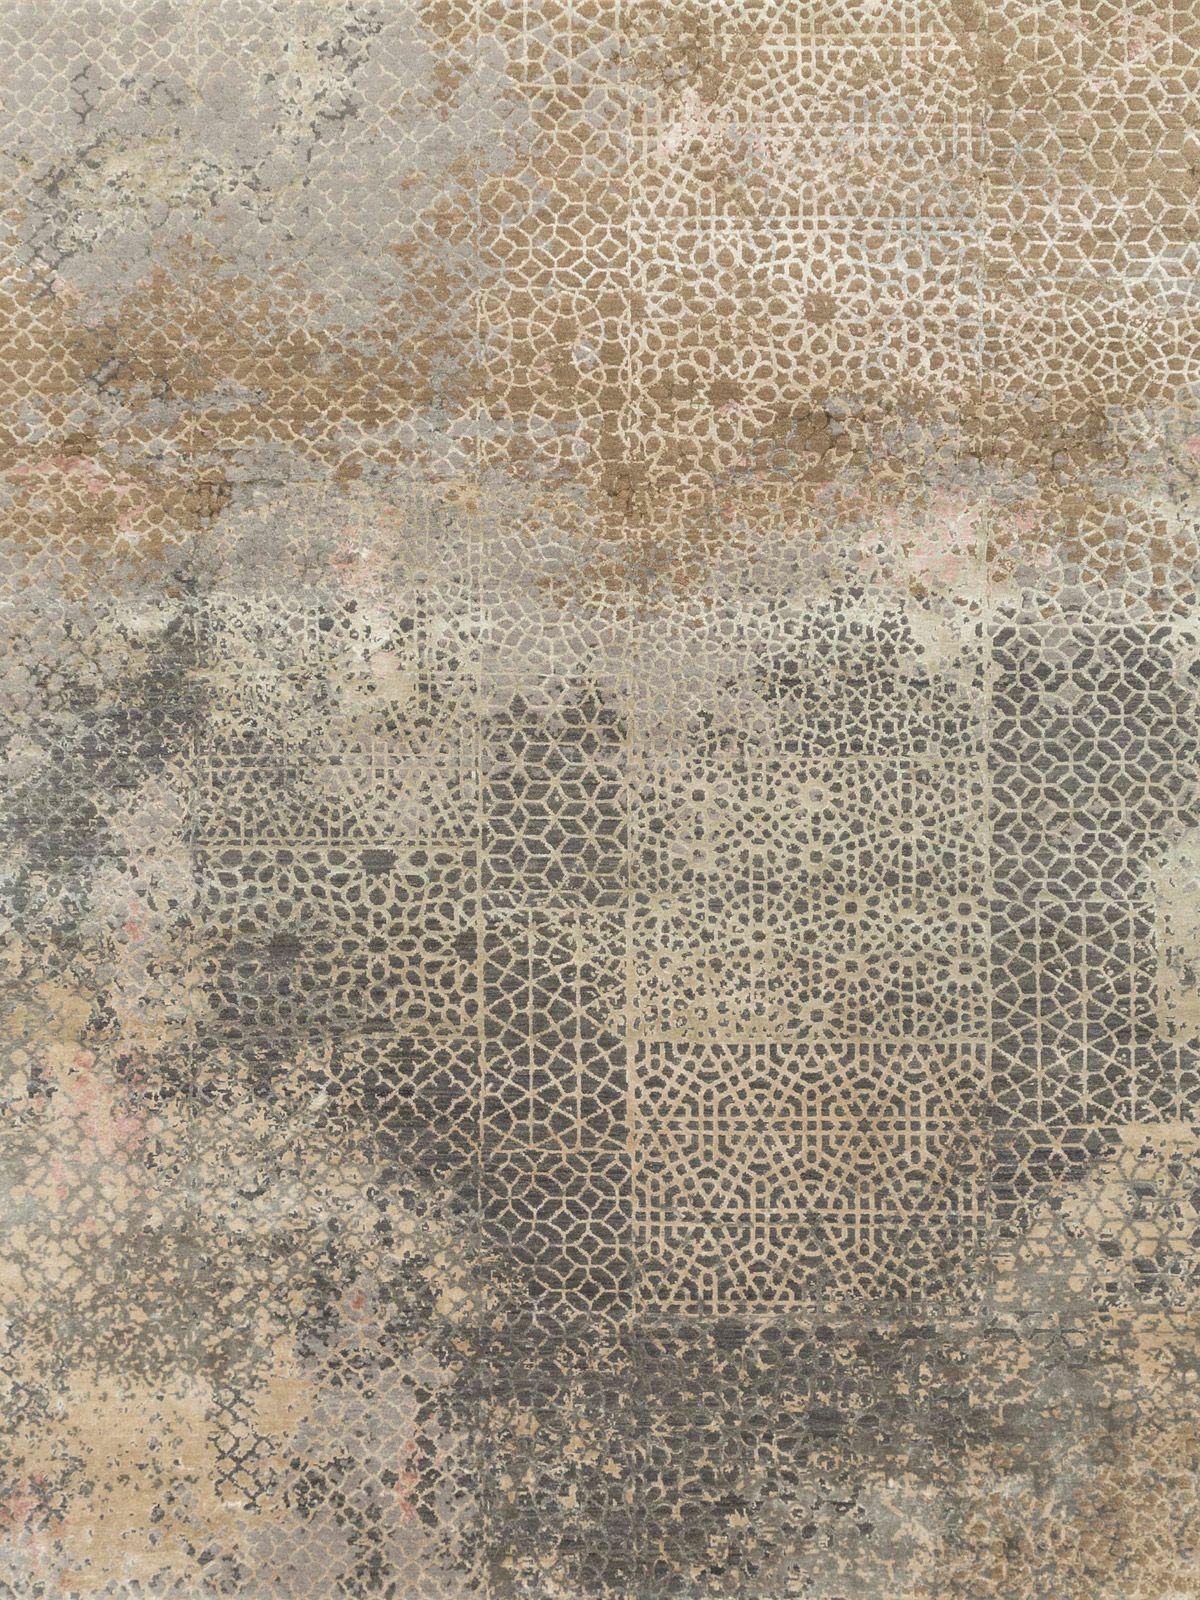 Carpet Flooring Flooring Bohemia Ivory Clay Rug Bohemia Clay Ivory Rug In 2020 Rug Shopping Rugs On Carpet Rugs